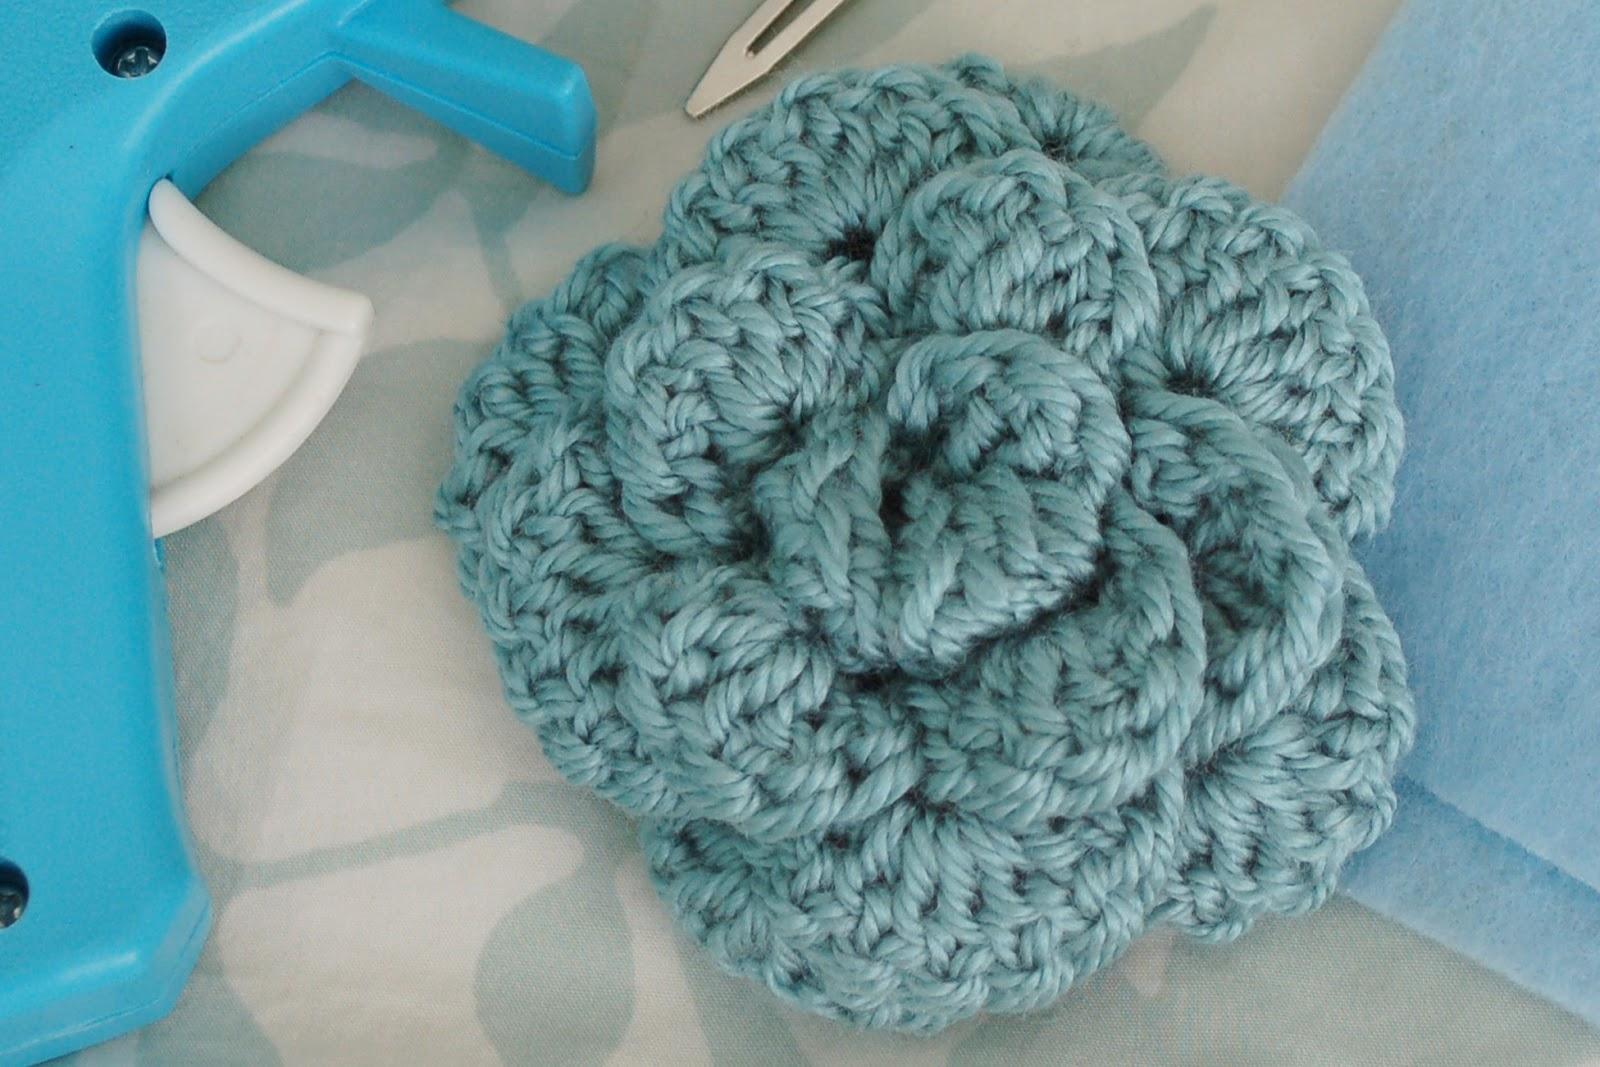 Crochet Rose Pattern No Sew : Alli Crafts: Free Pattern: No-sew Rose, Large